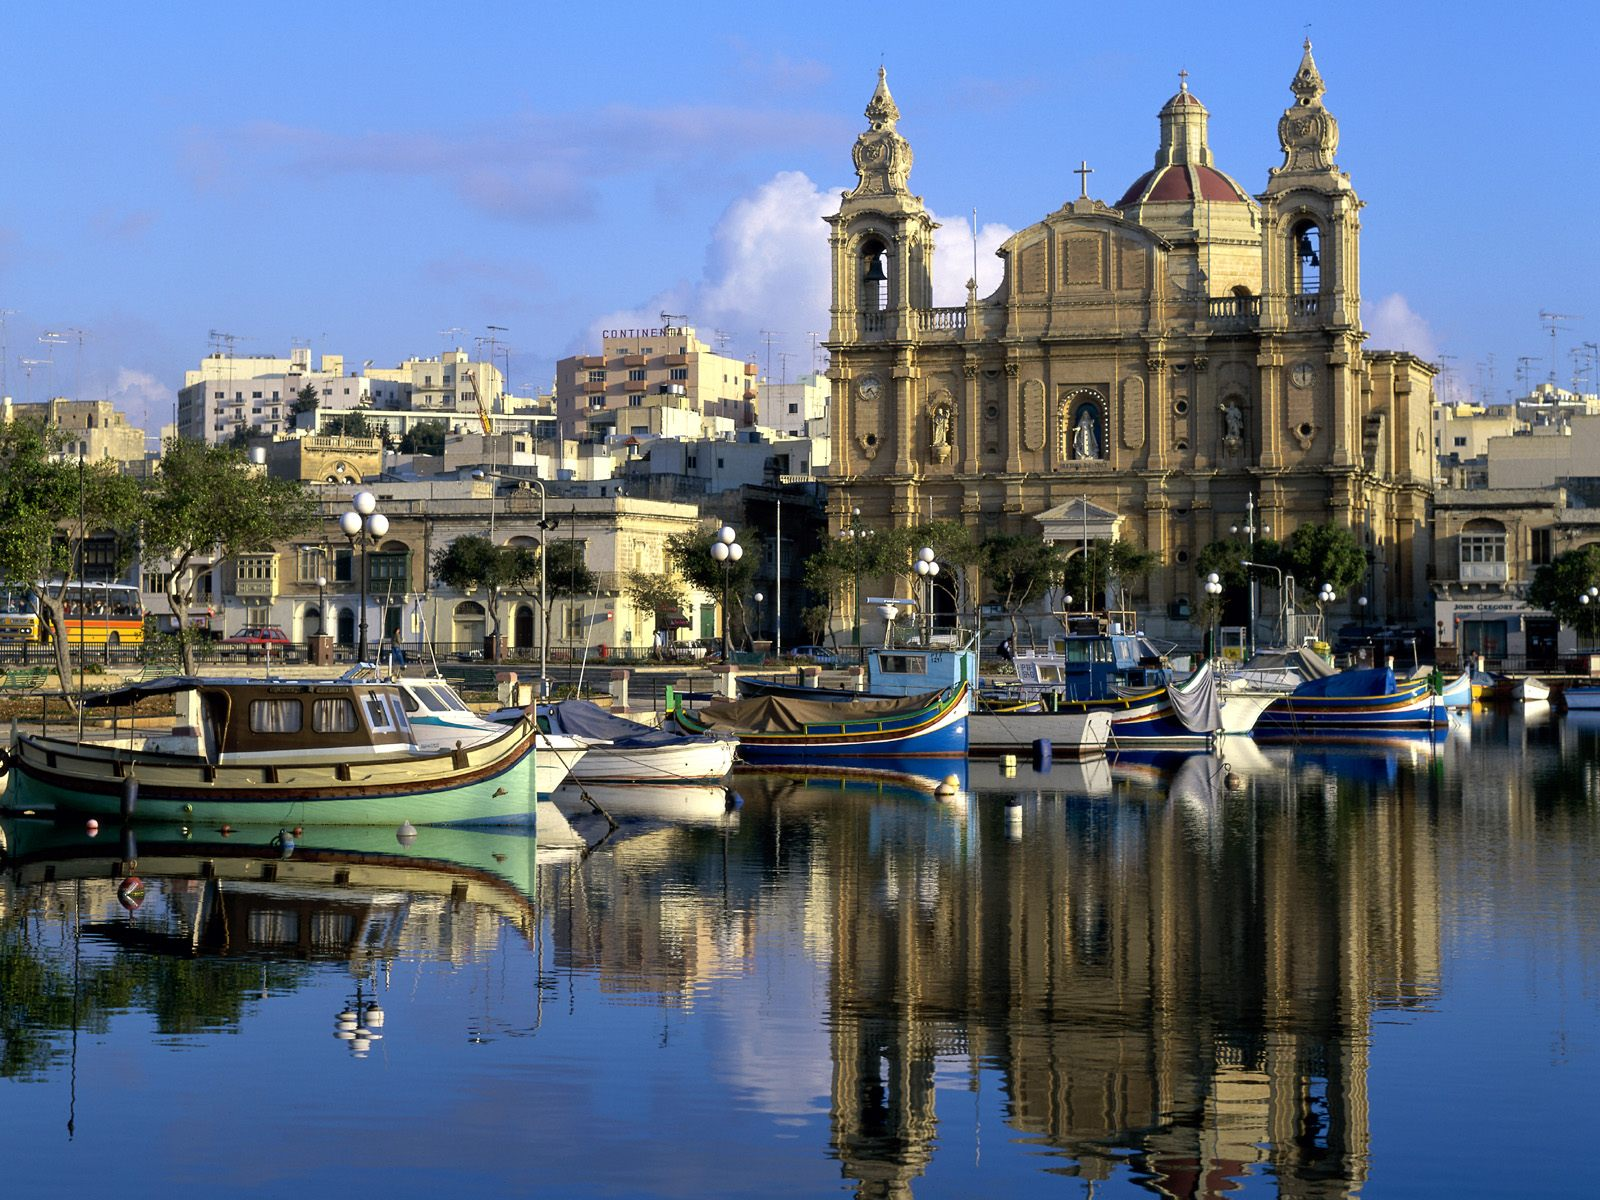 harborside20msida20malta Viajes baratos a Malta, el gran museo al aire libre de la historia del Mediterráneo